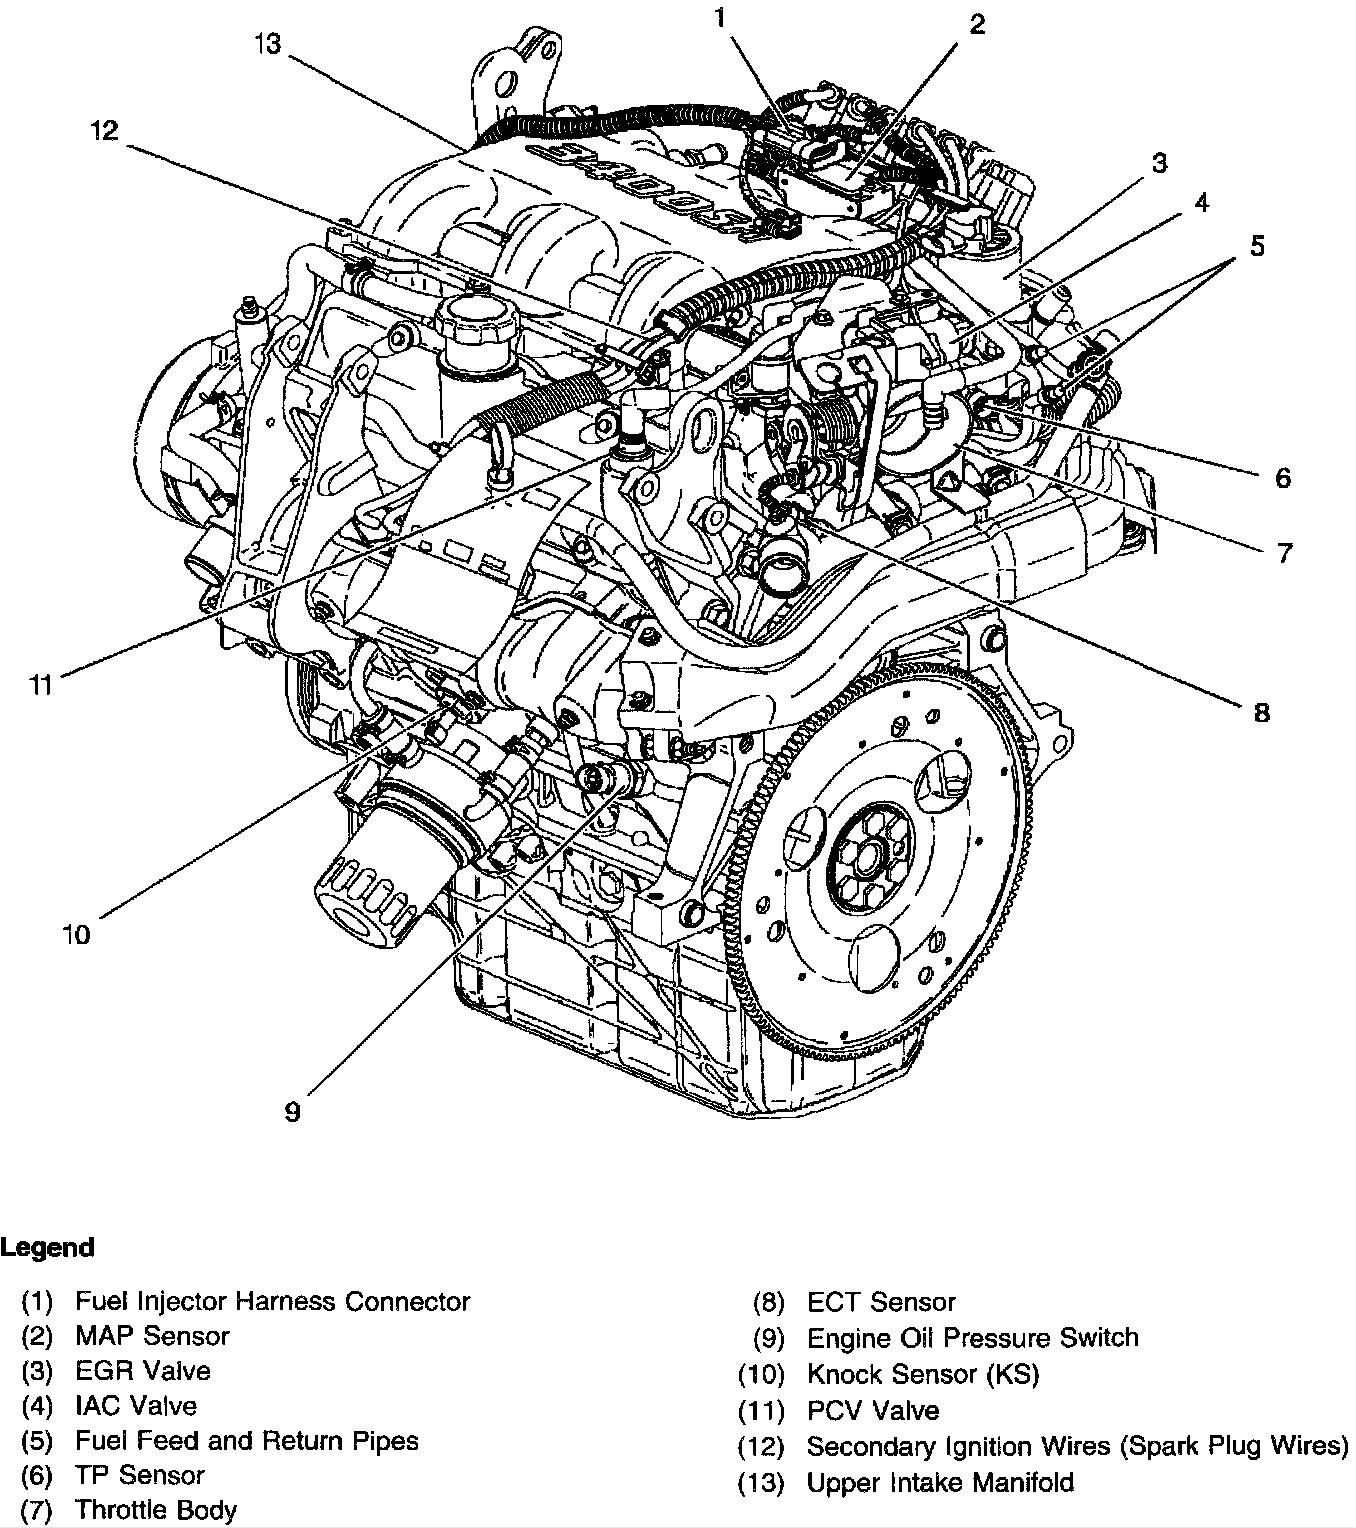 1995 Grand Am Engine Diagram Wiring Diagram Browse A Browse A Cfcarsnoleggio It